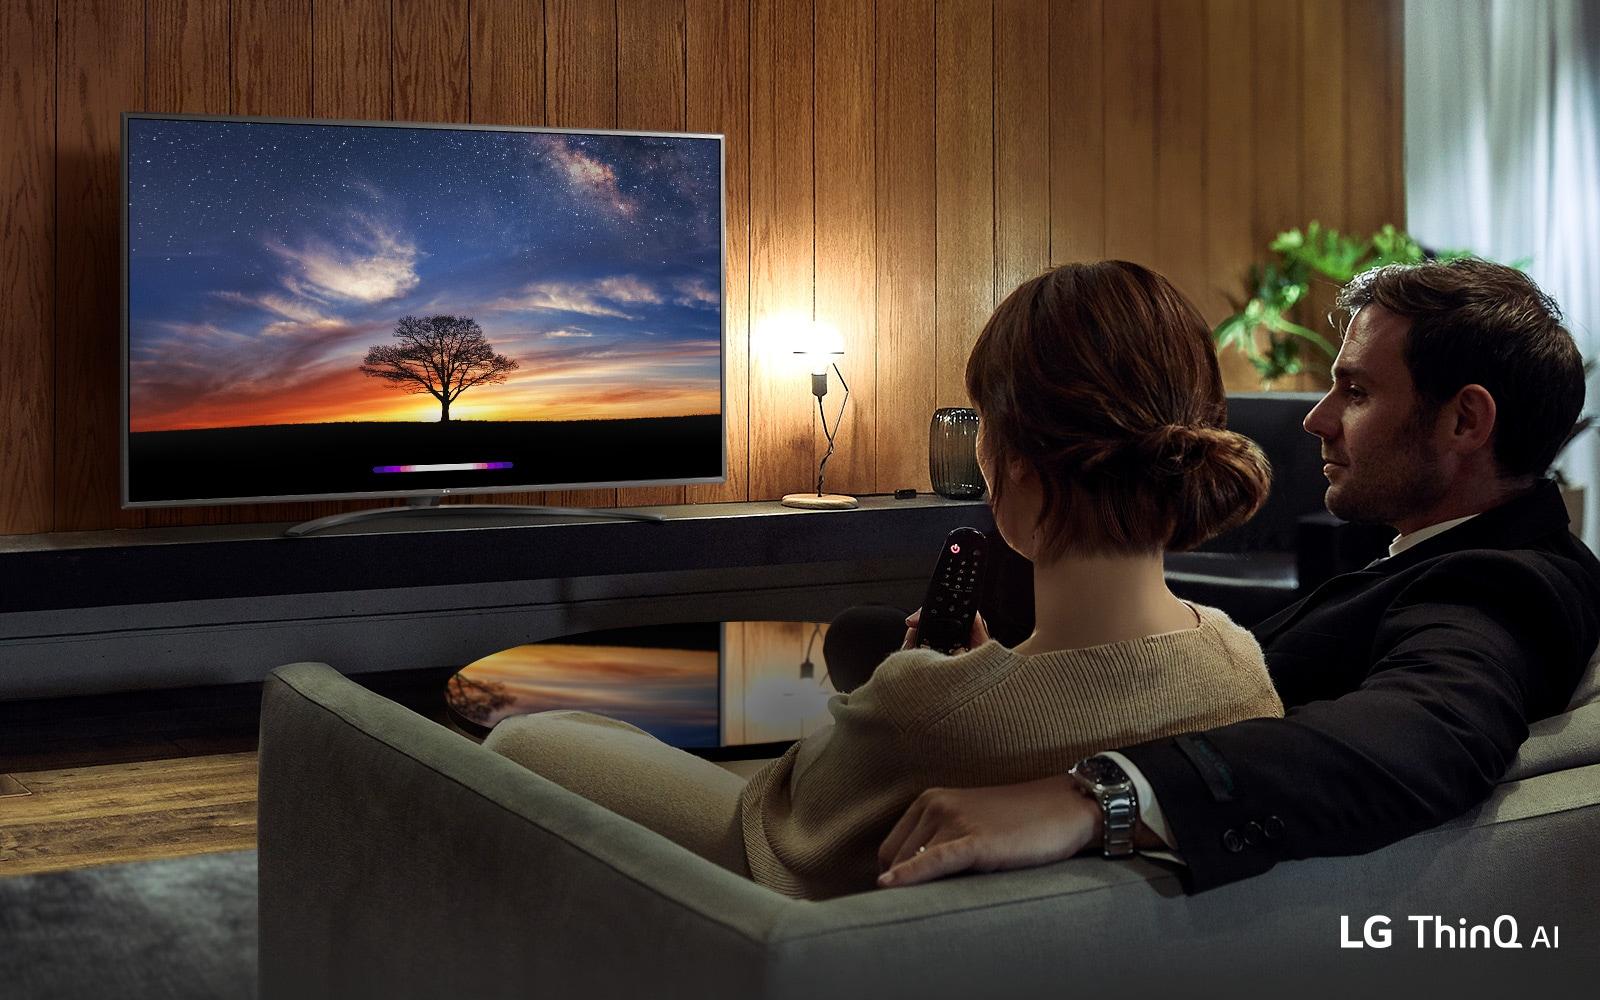 TV-UHD-60-UM72-01-AI-ThinQ-Desktop